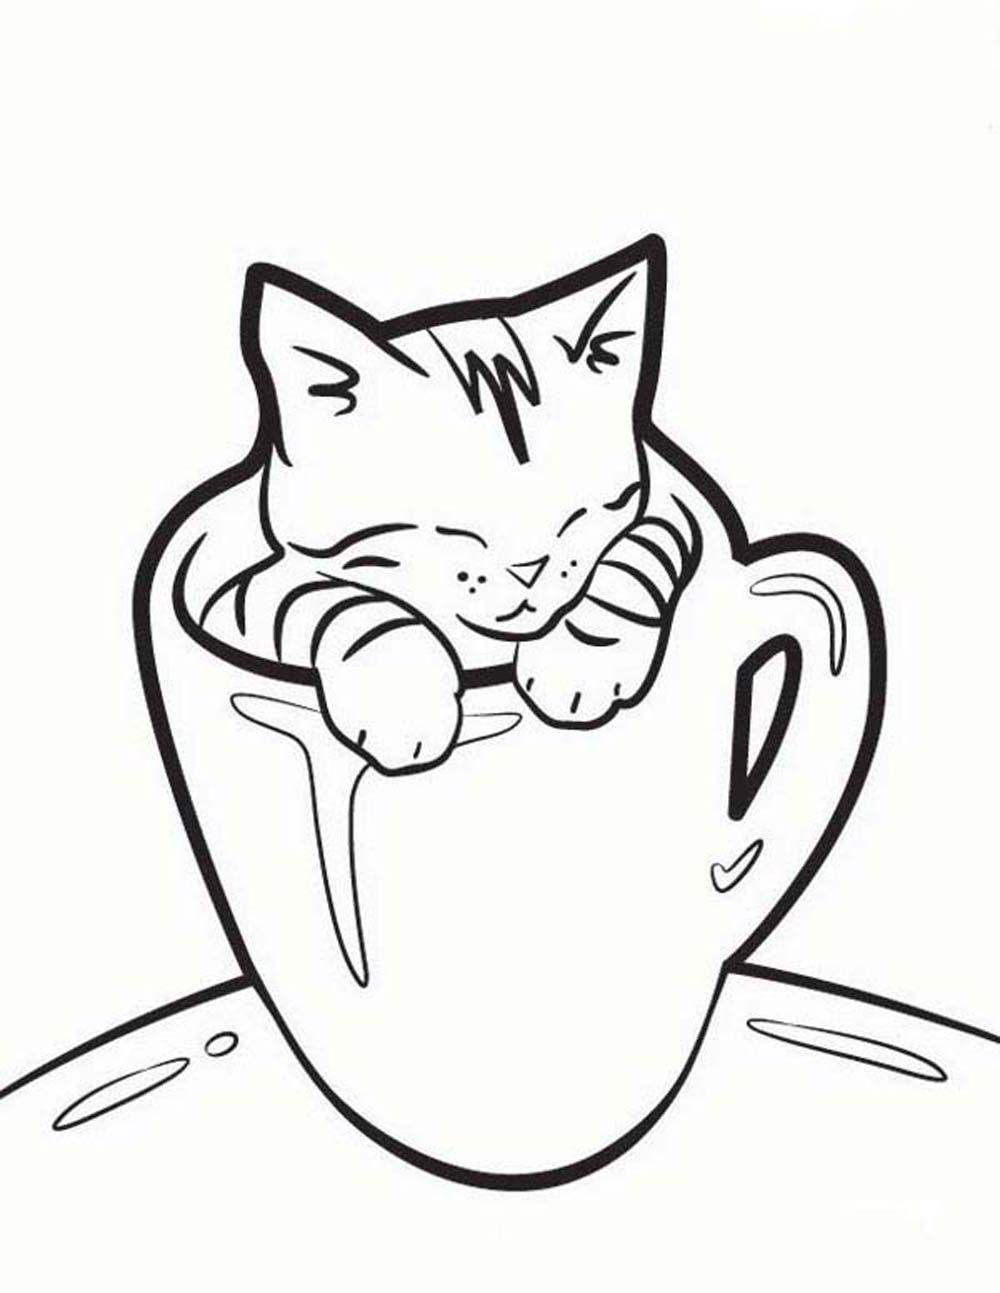 A10d73cdb50a93b74ad13f8f0ebd2194 Jpg 1000 1293 Cat Coloring Book Kittens Coloring Kitten Drawing